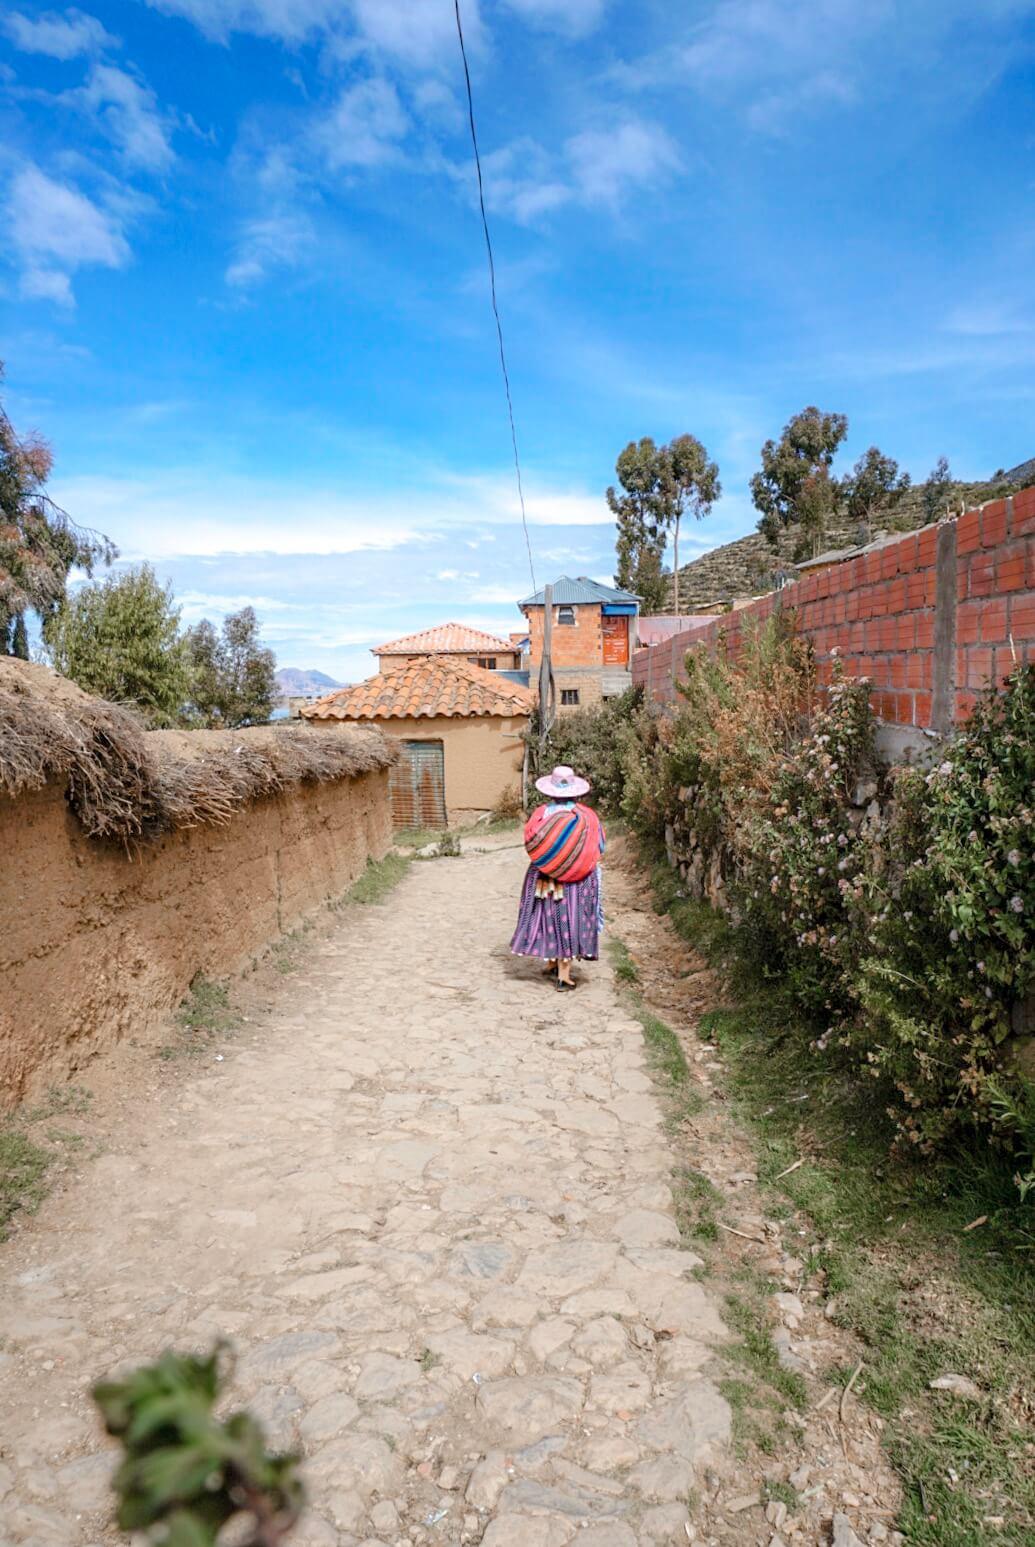 quelle excursion isla del sol titicaca copacabana bolivie